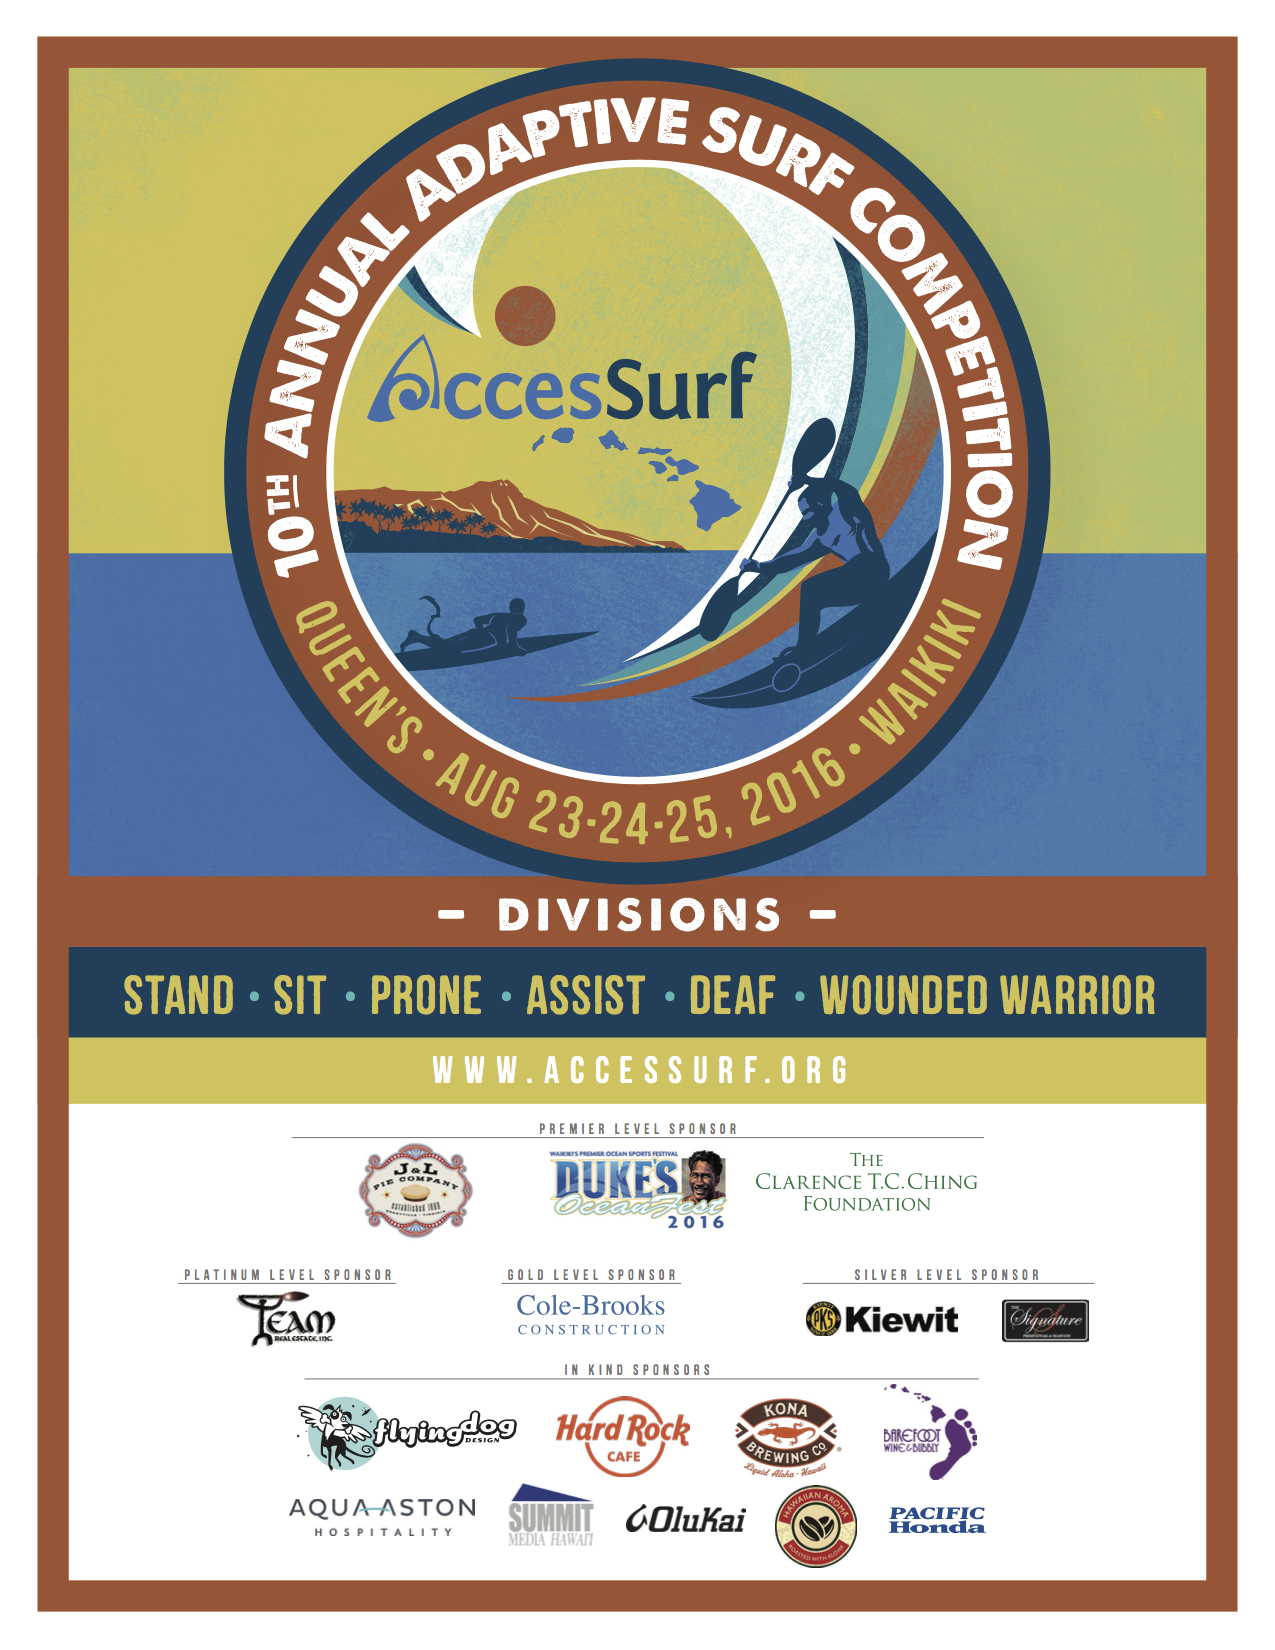 access-surf-hawaiian-aroma-caffe